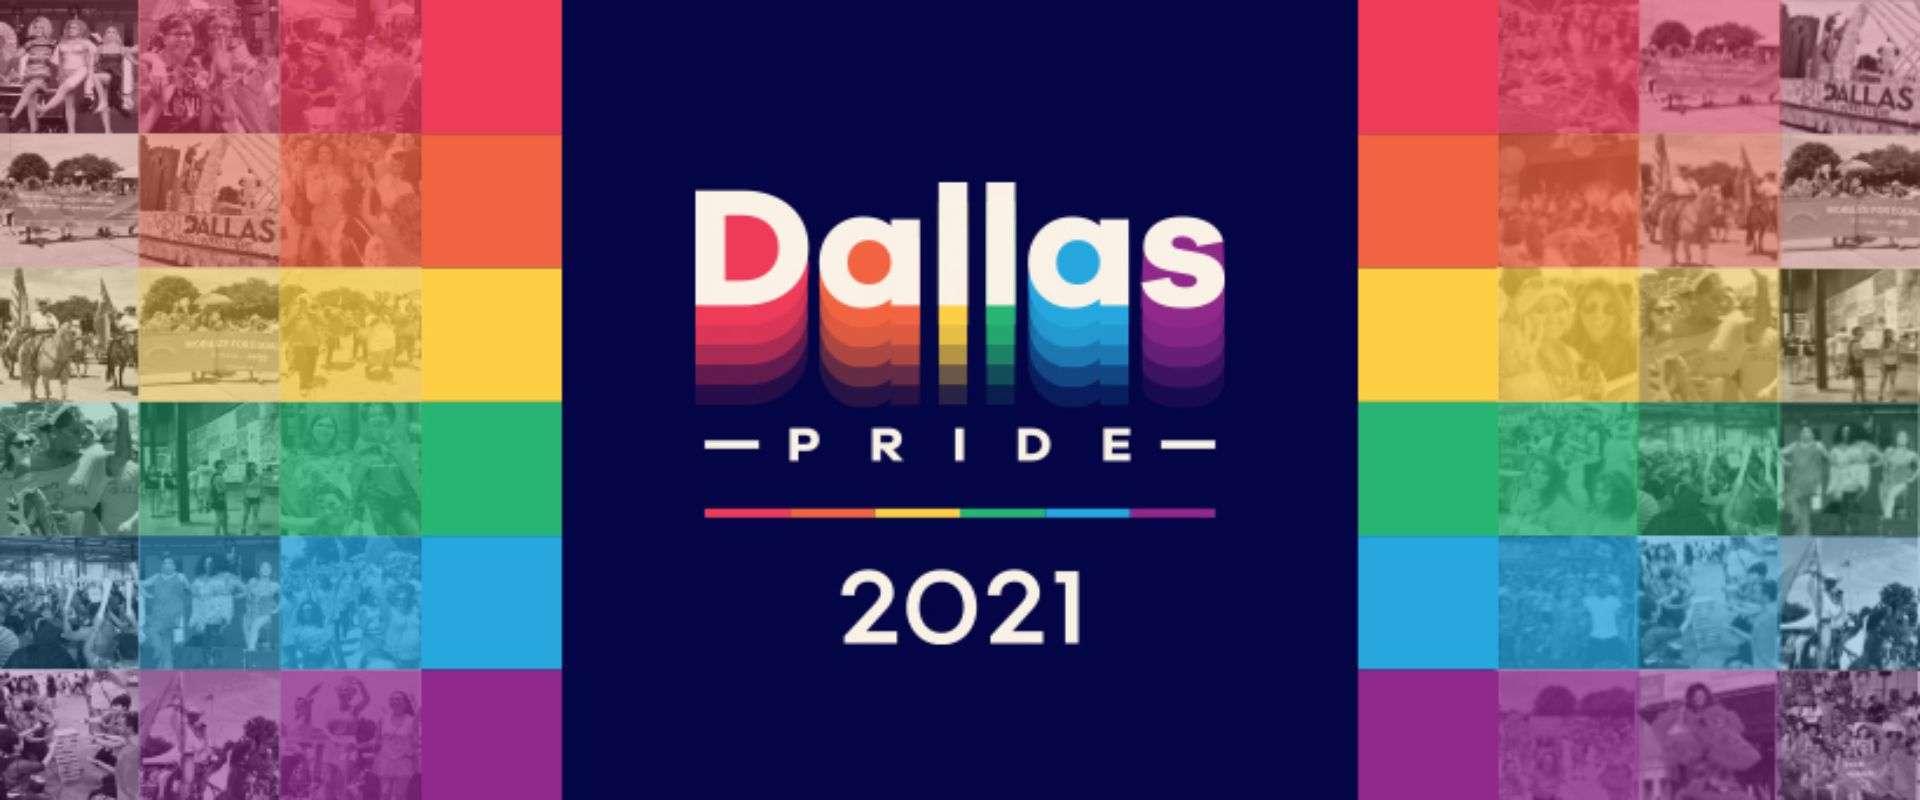 Dallas Pride 2021 - June 4 & June 5